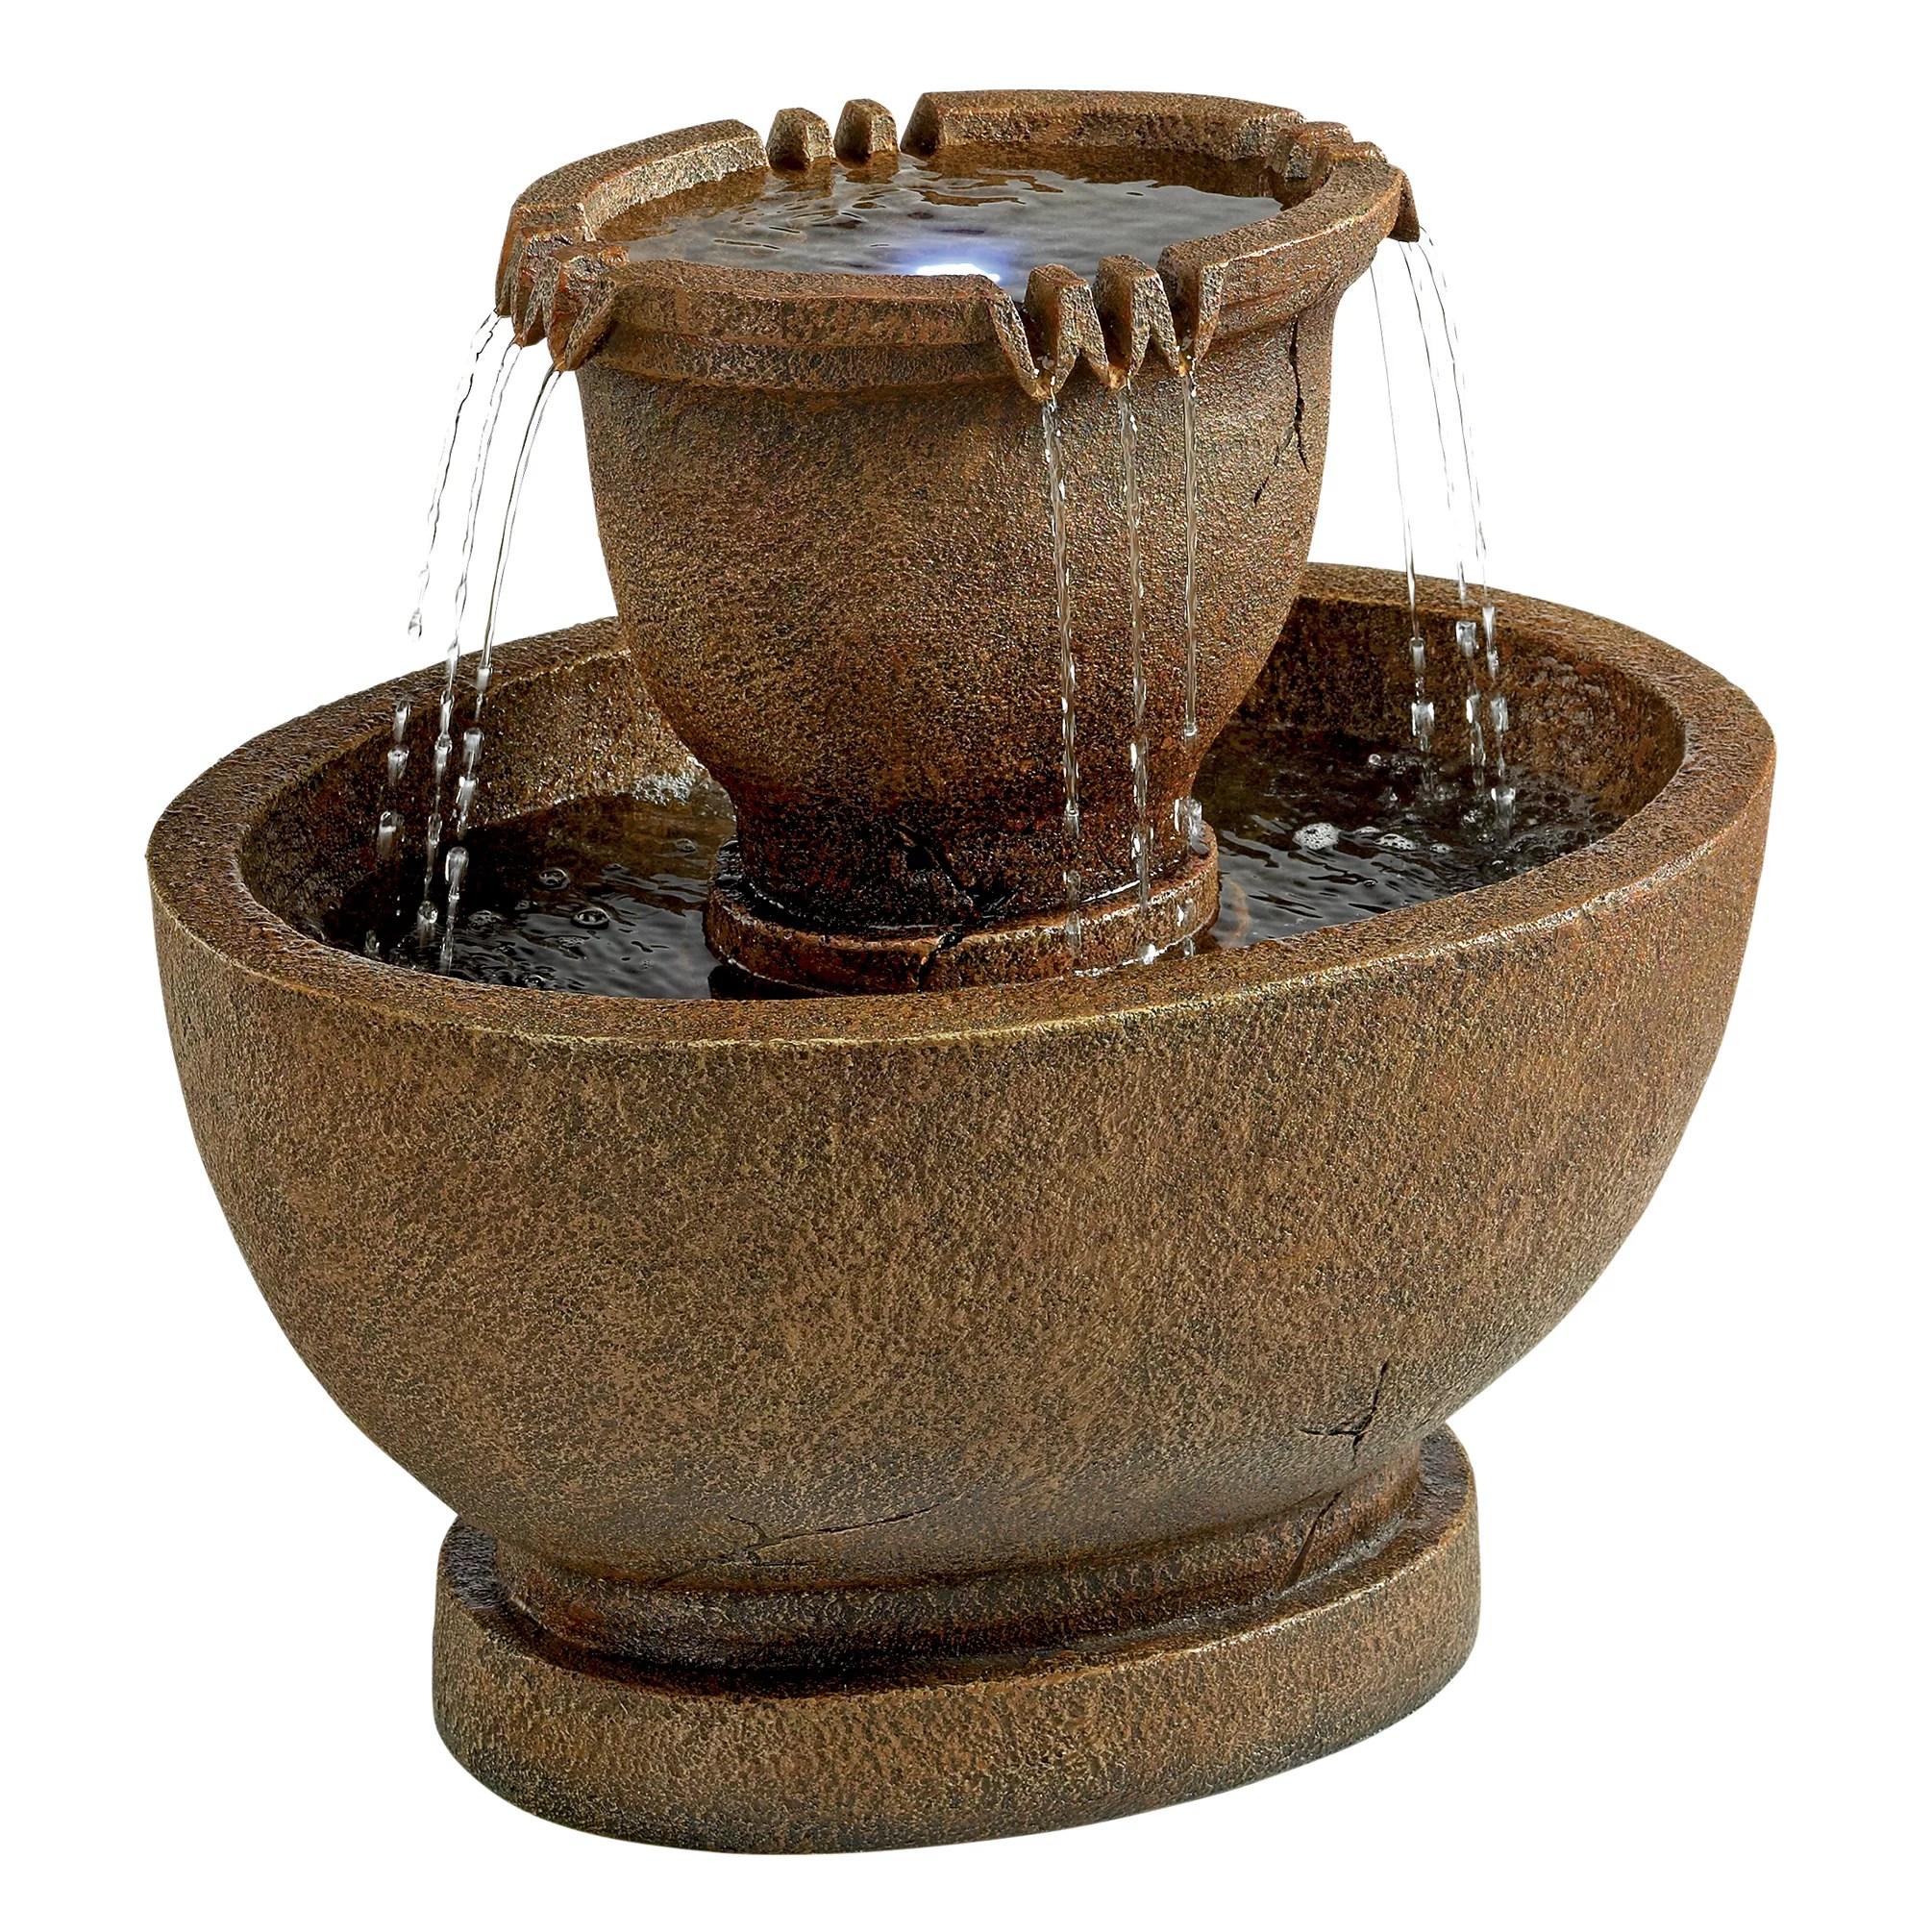 Design Toscano Resin Richardson Oval Urns Cascading Garden